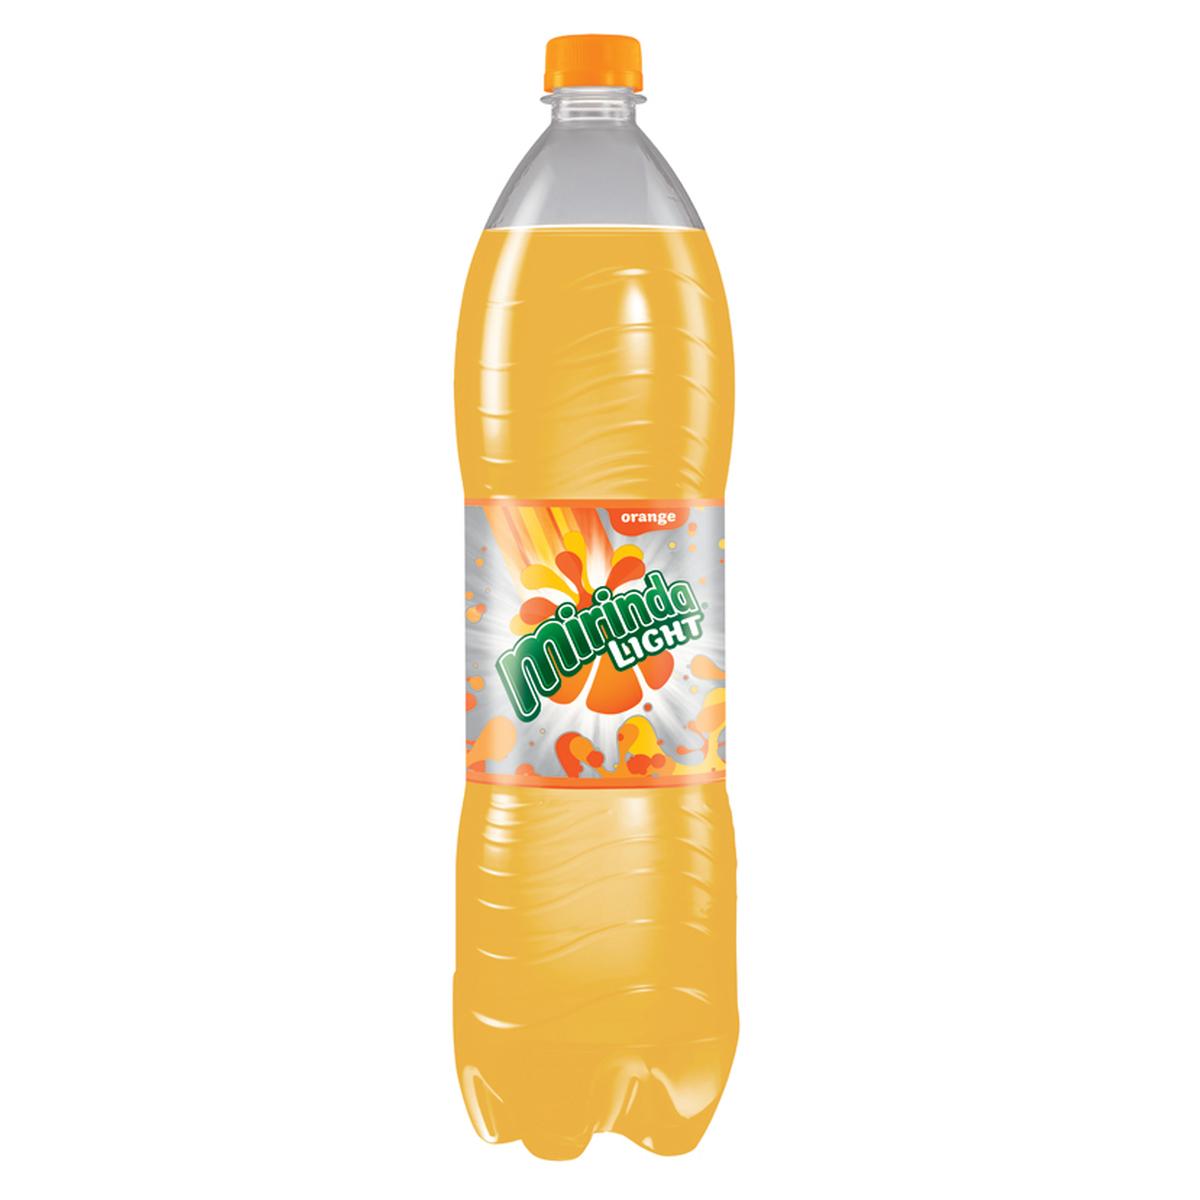 Mirinda Light 1,5l | Cola, Limonaden & Co | Alkoholfreie Getränke ...